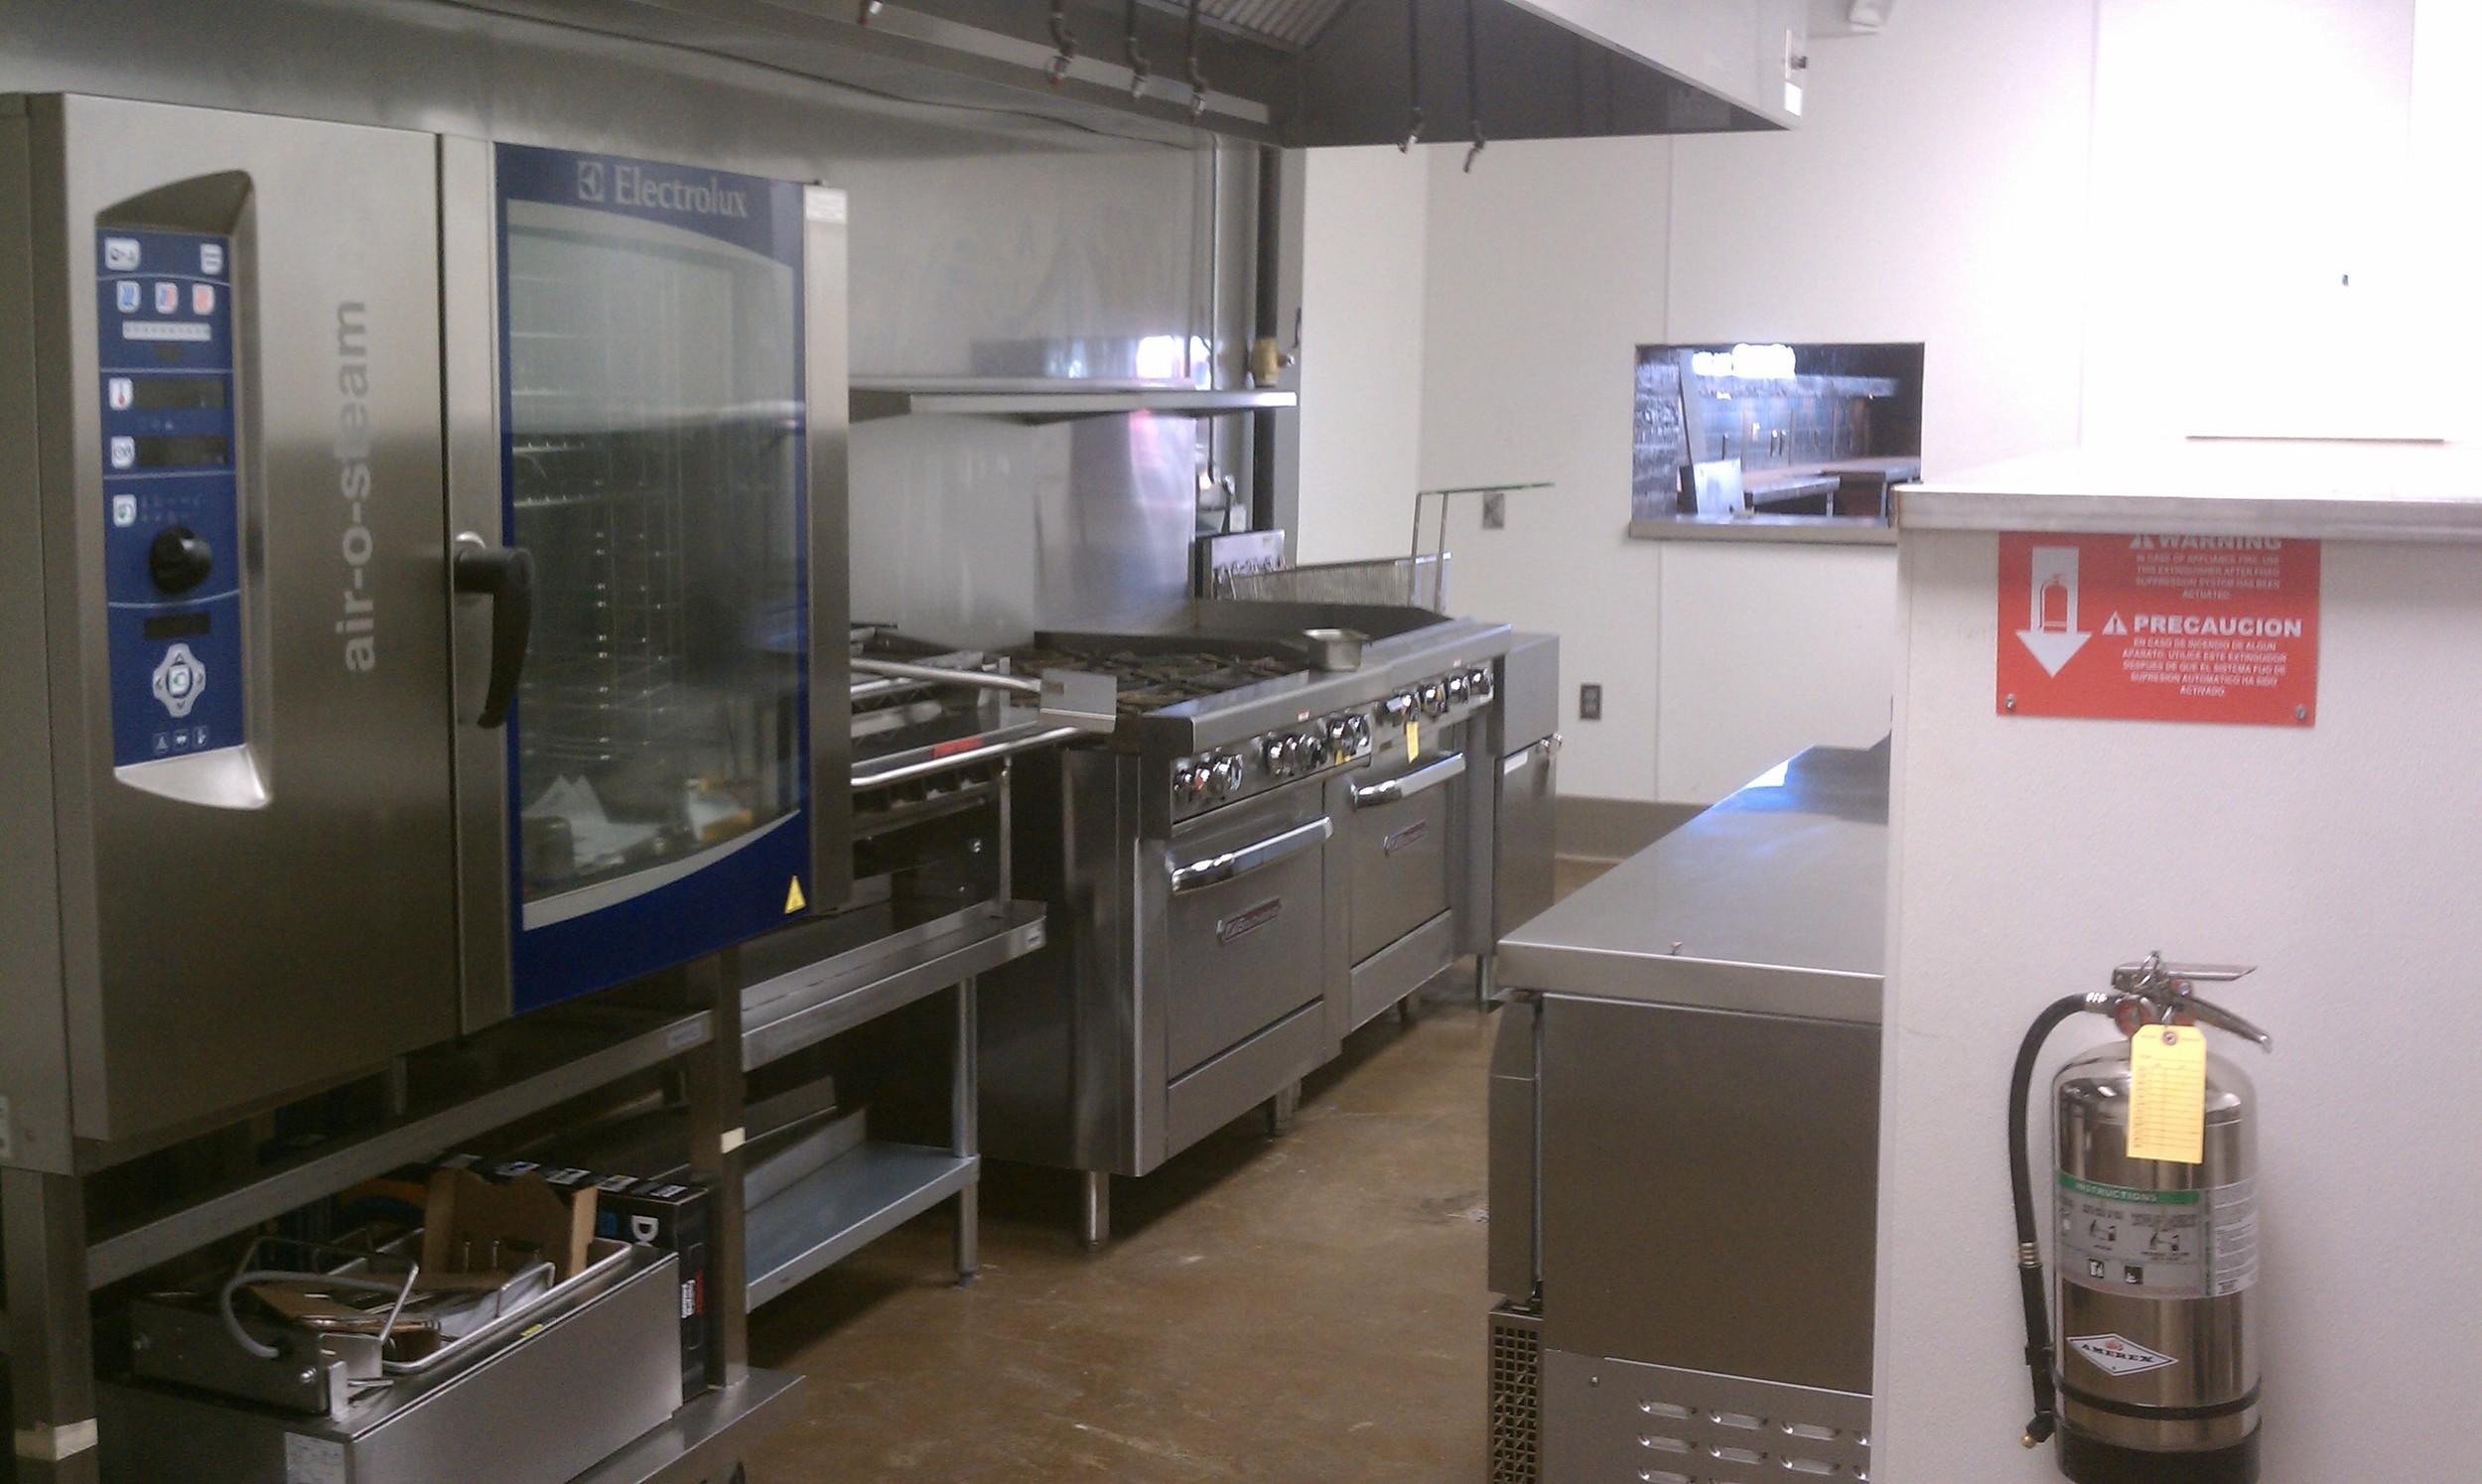 Oven, Range, and Fryer